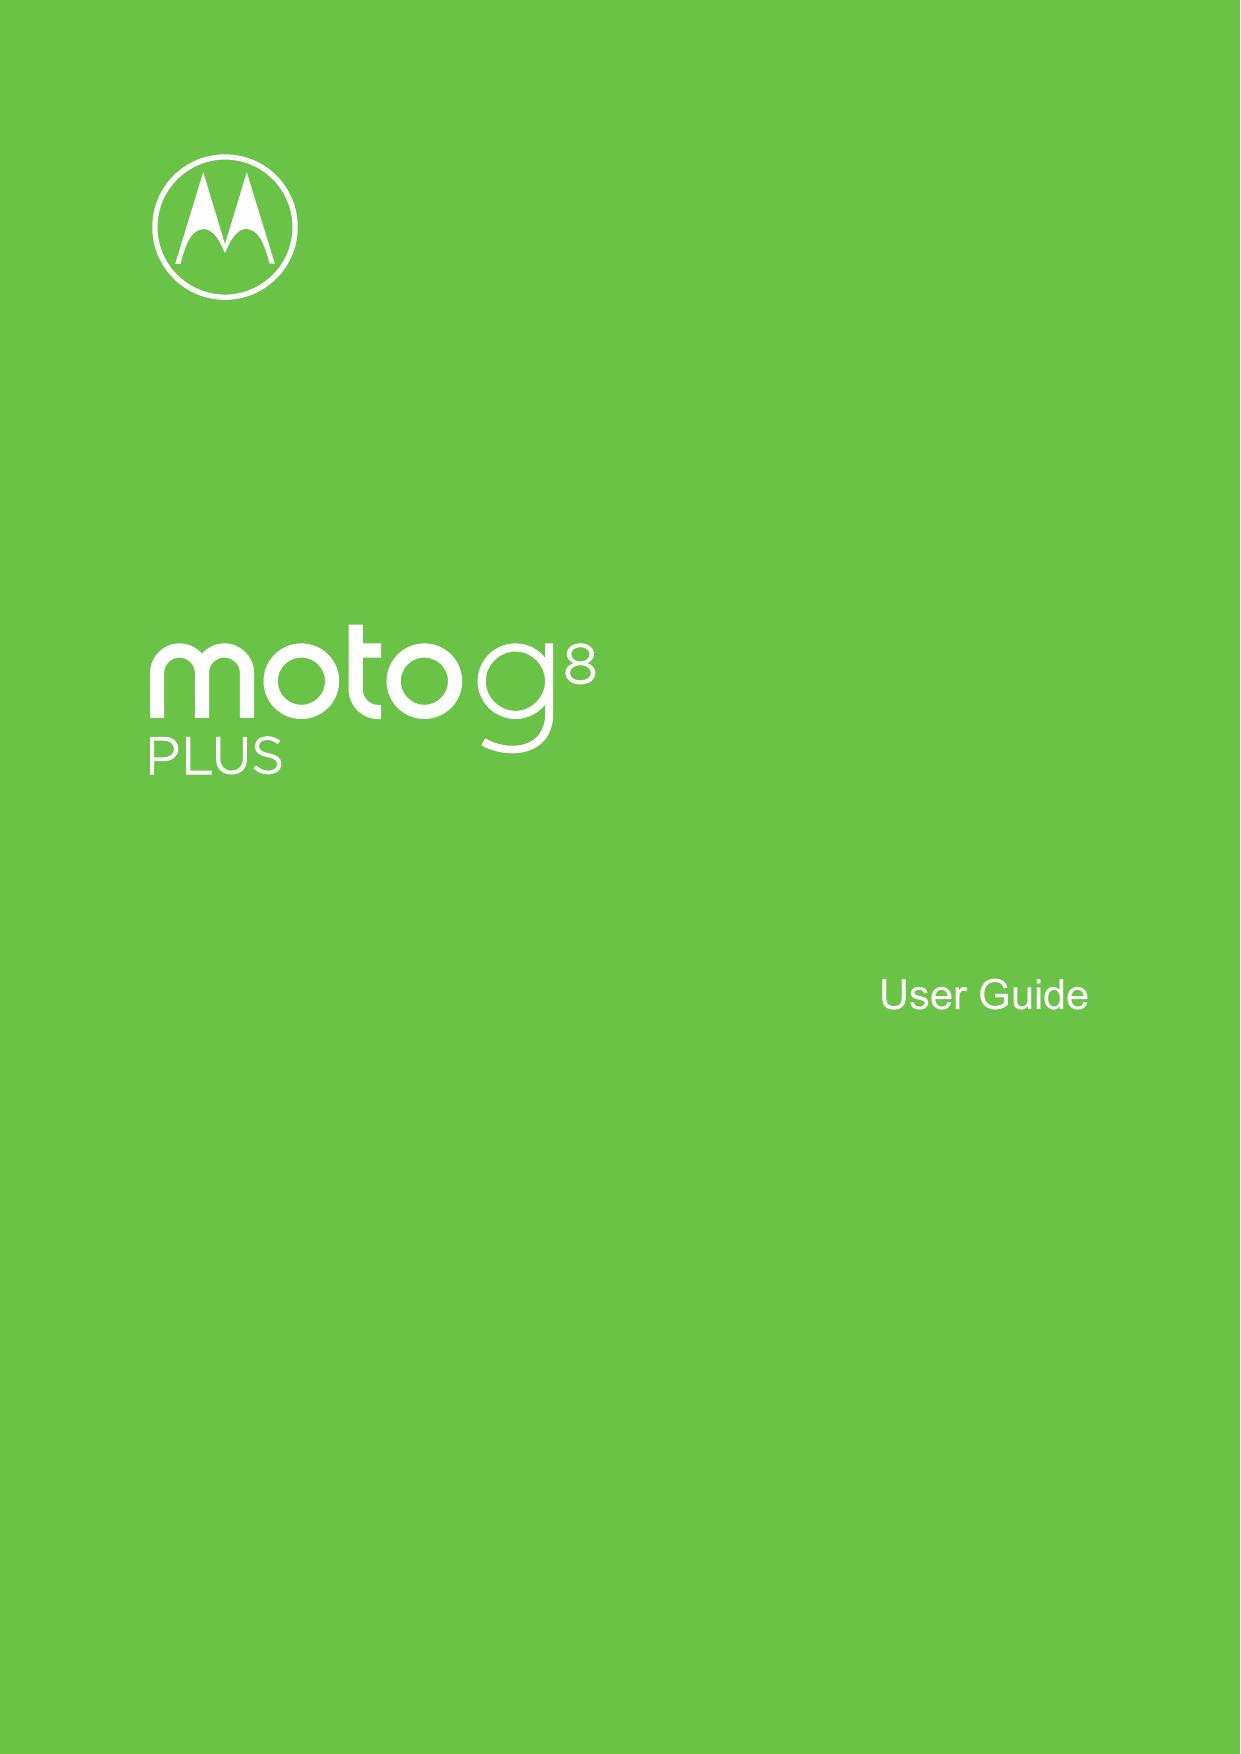 Motorola moto g manual user guide and instructions.